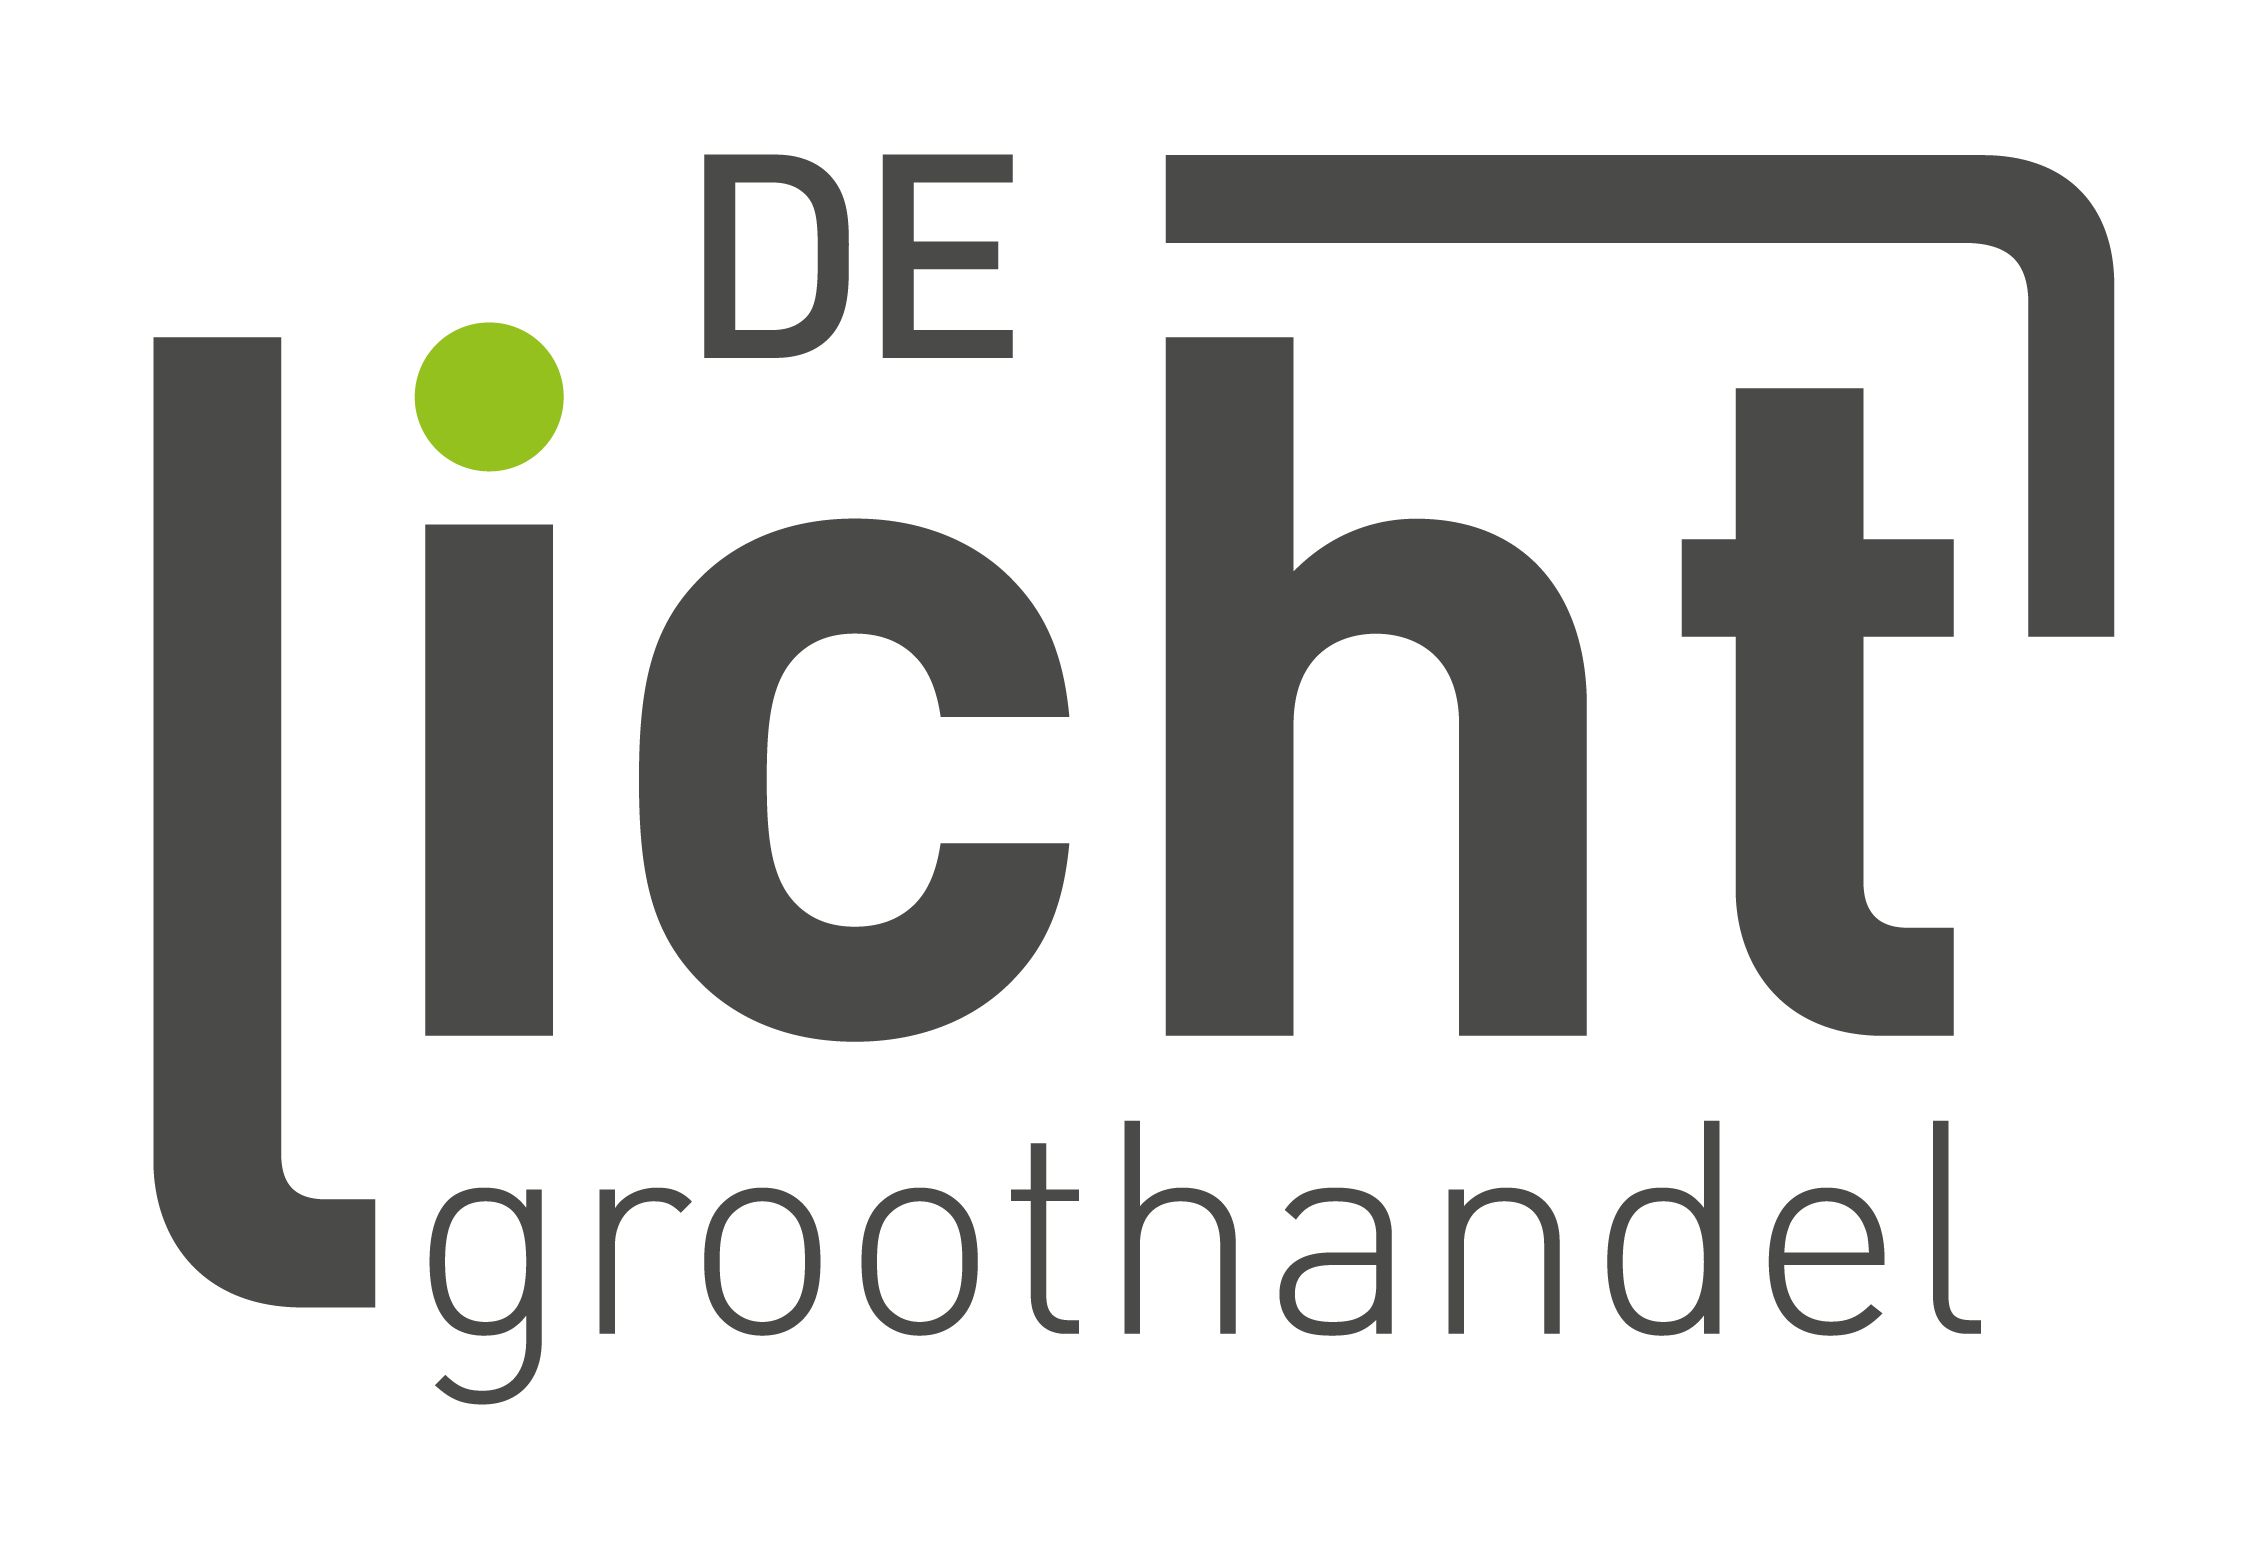 Lichtgroothandel logo